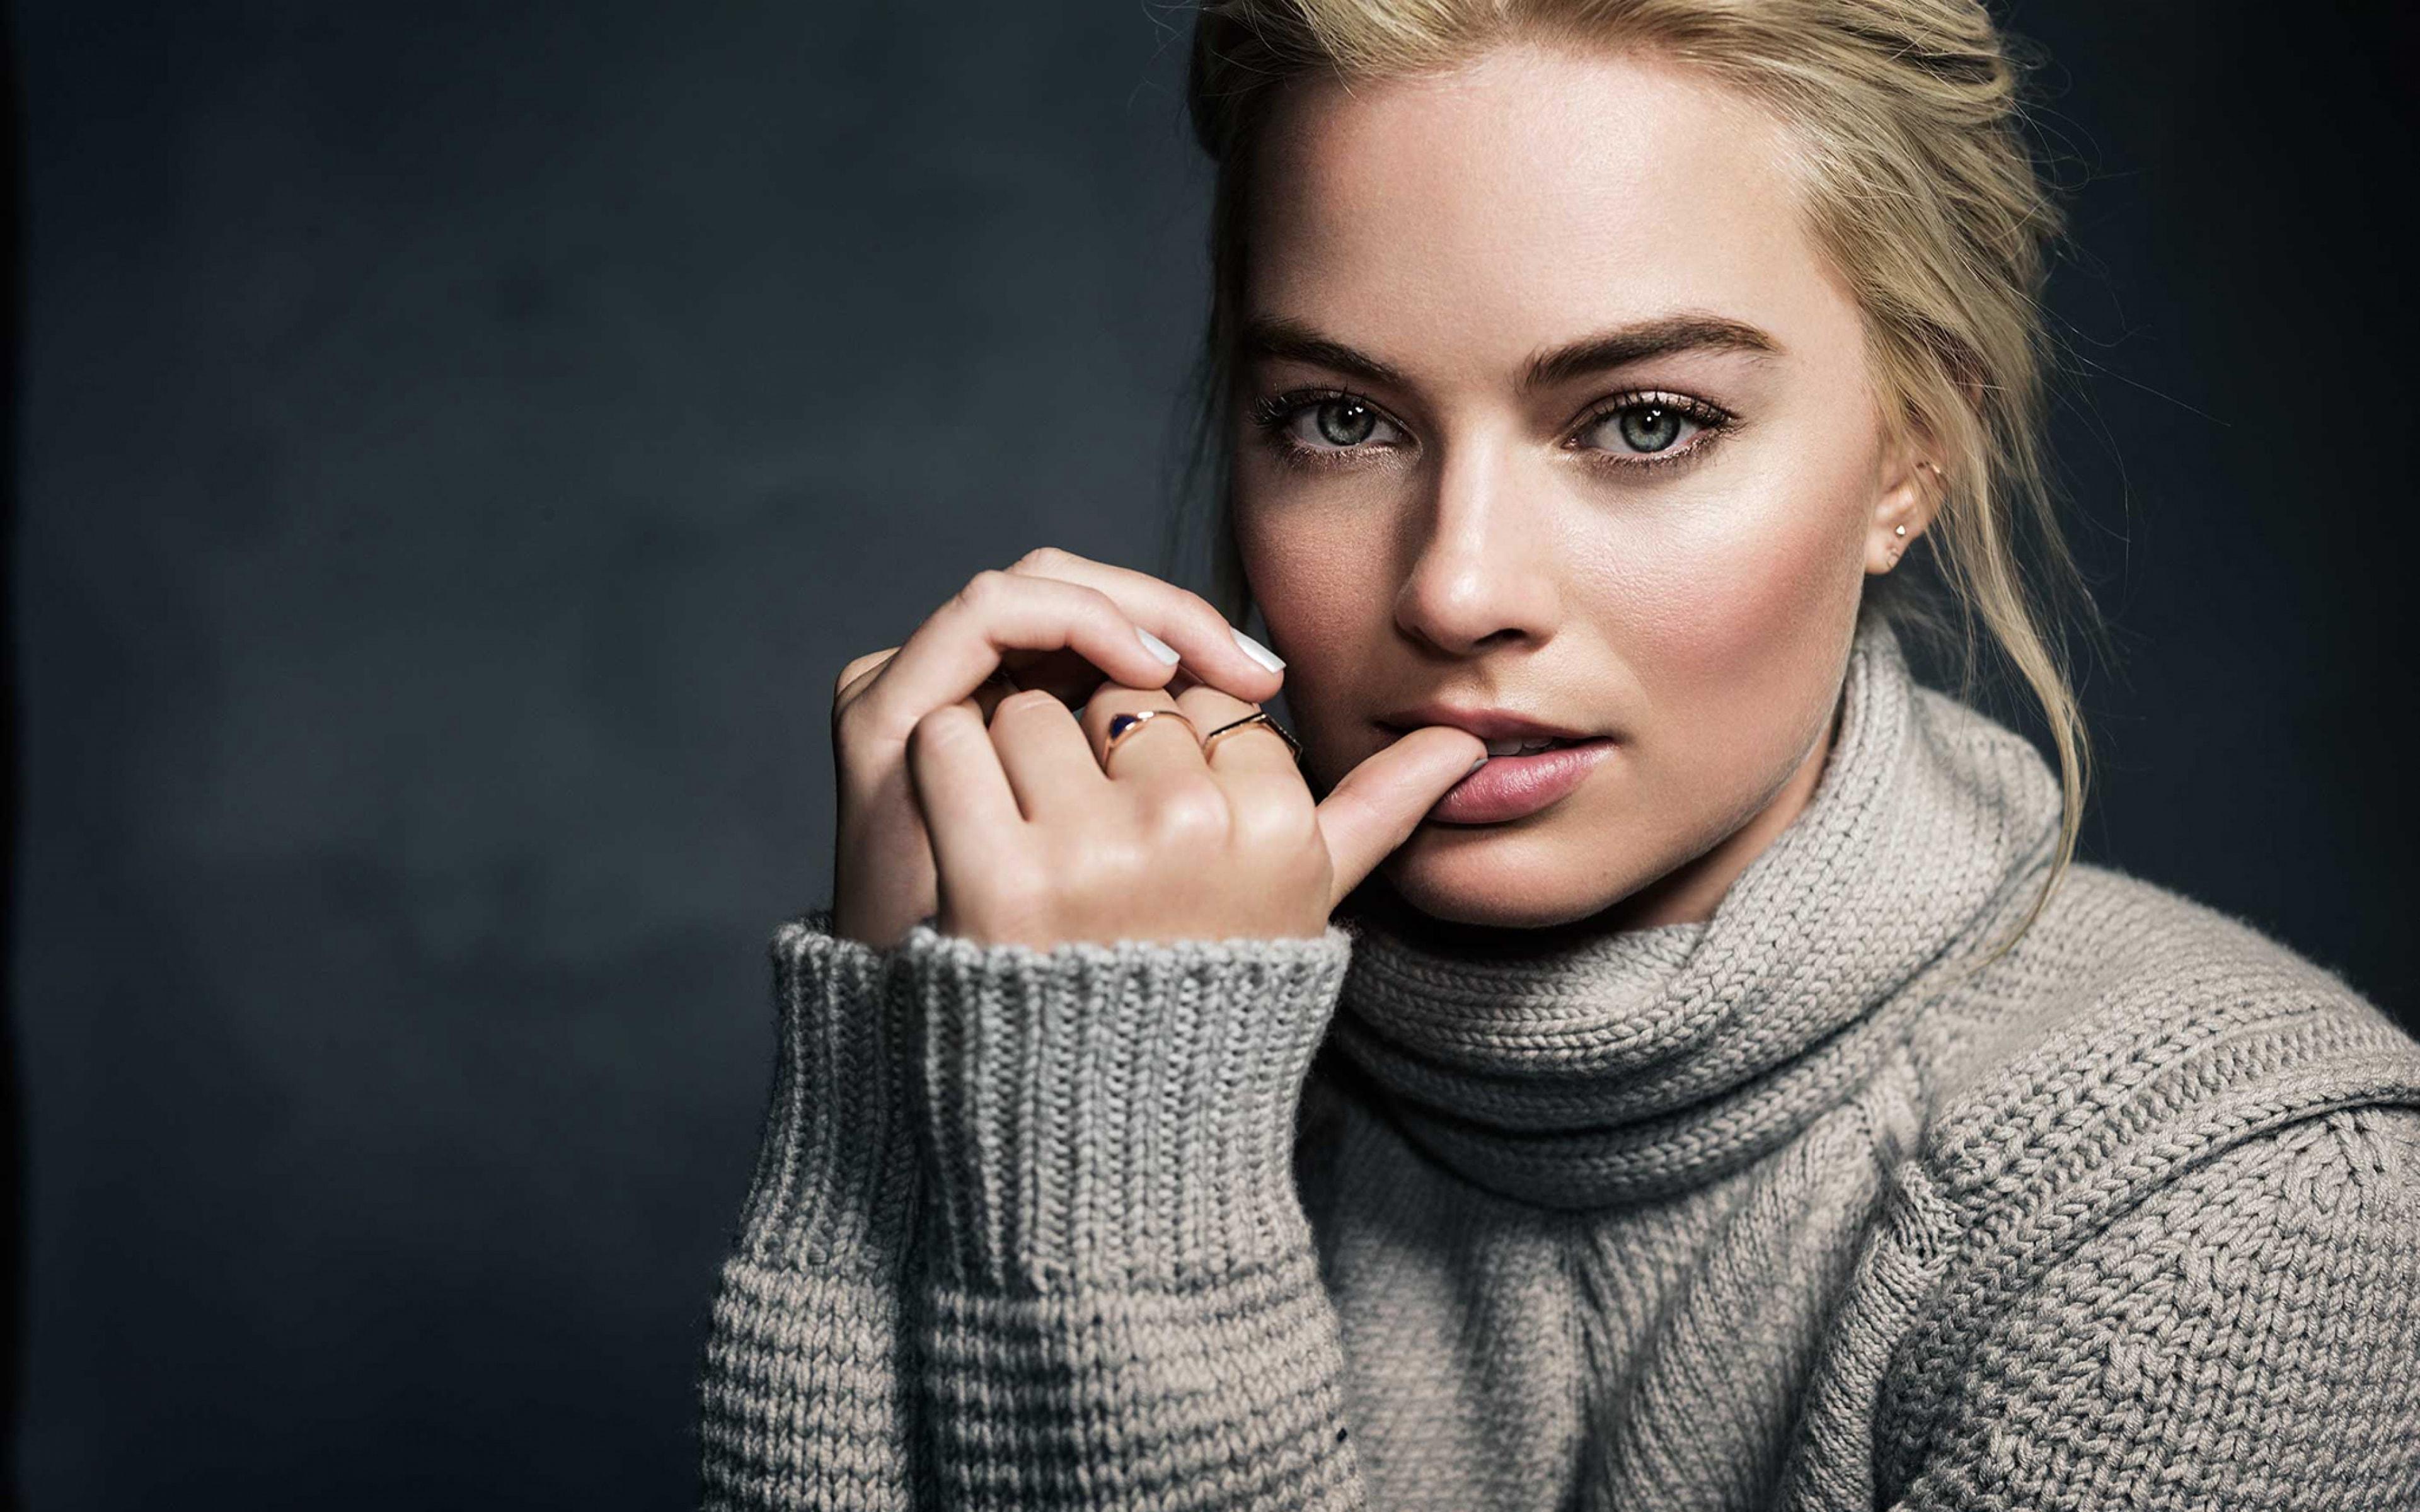 Margot Robbie Wallpapers hd